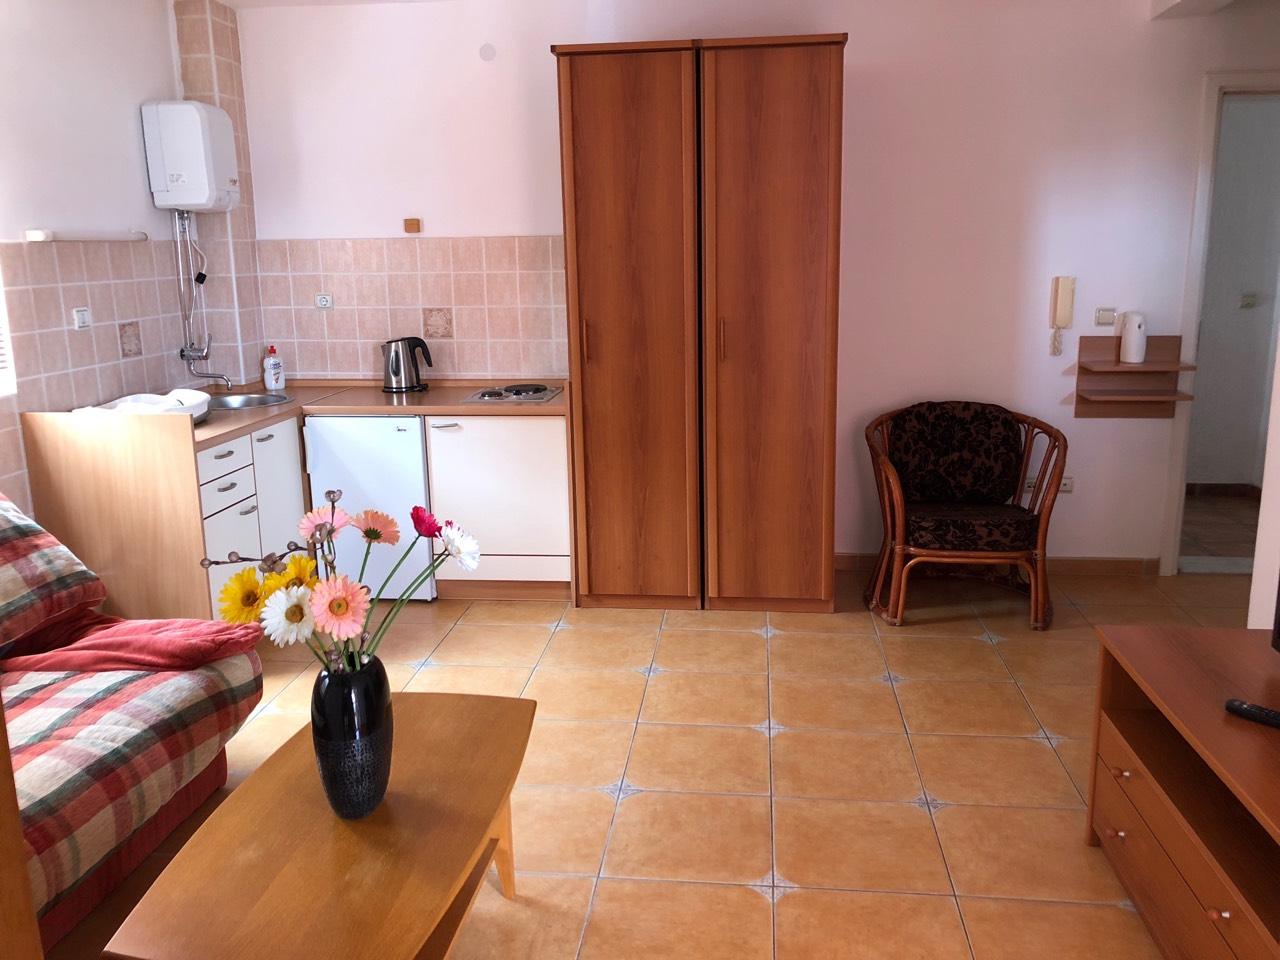 Jednosoban apartman nr.14 - Apartments Sofija 3